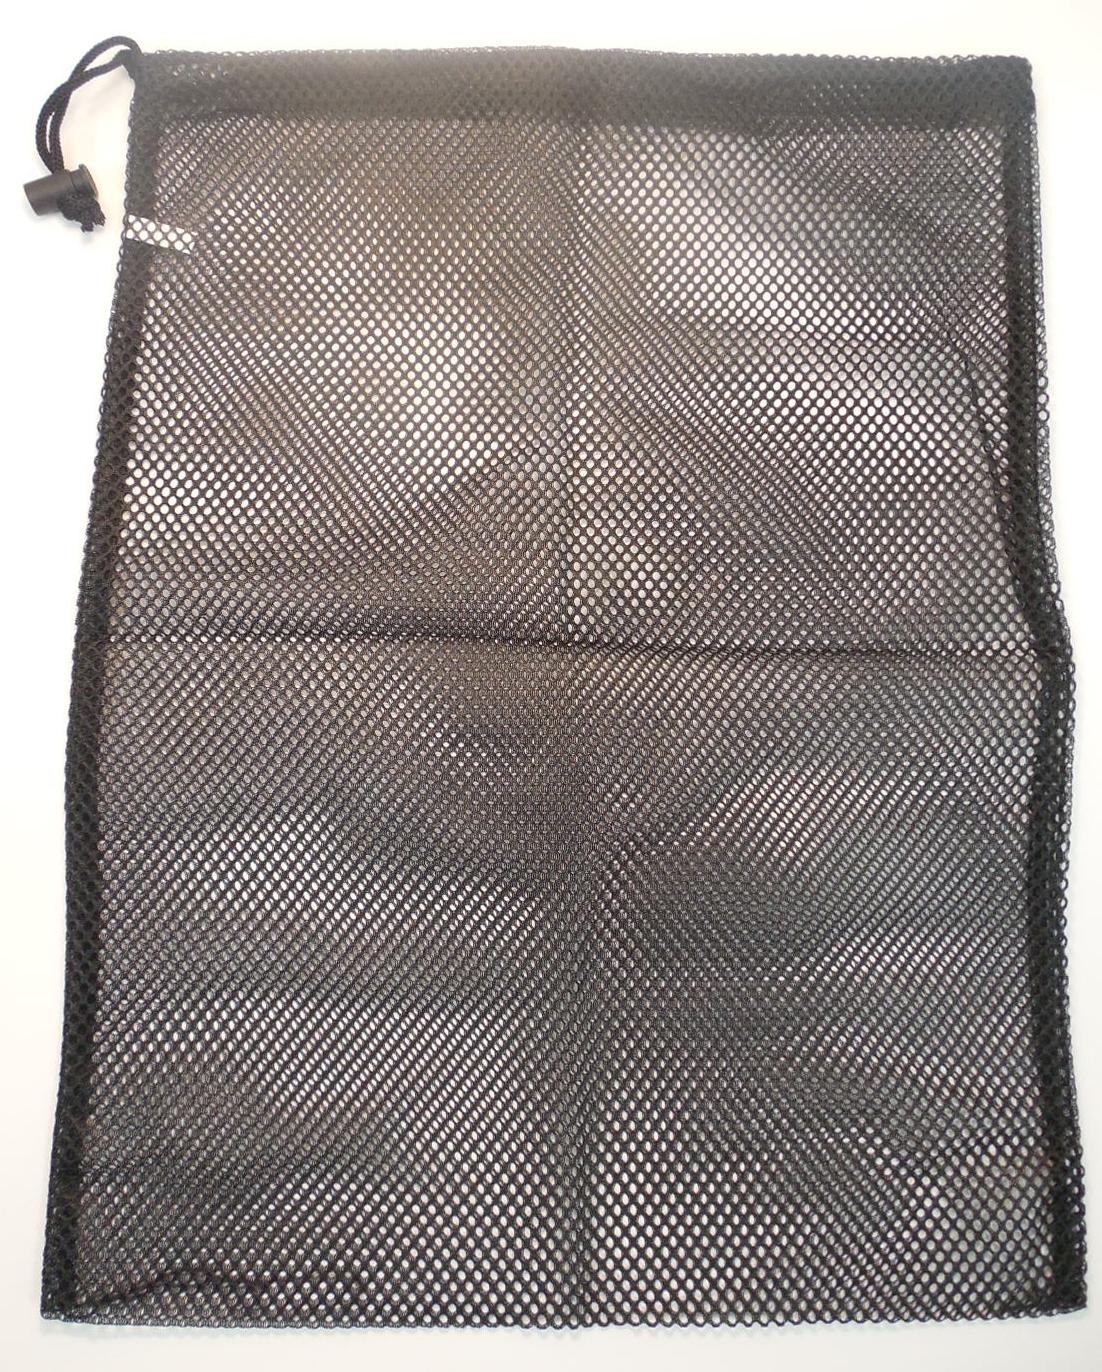 Armor Bags Mesh Small Bag 15 x 20 Black